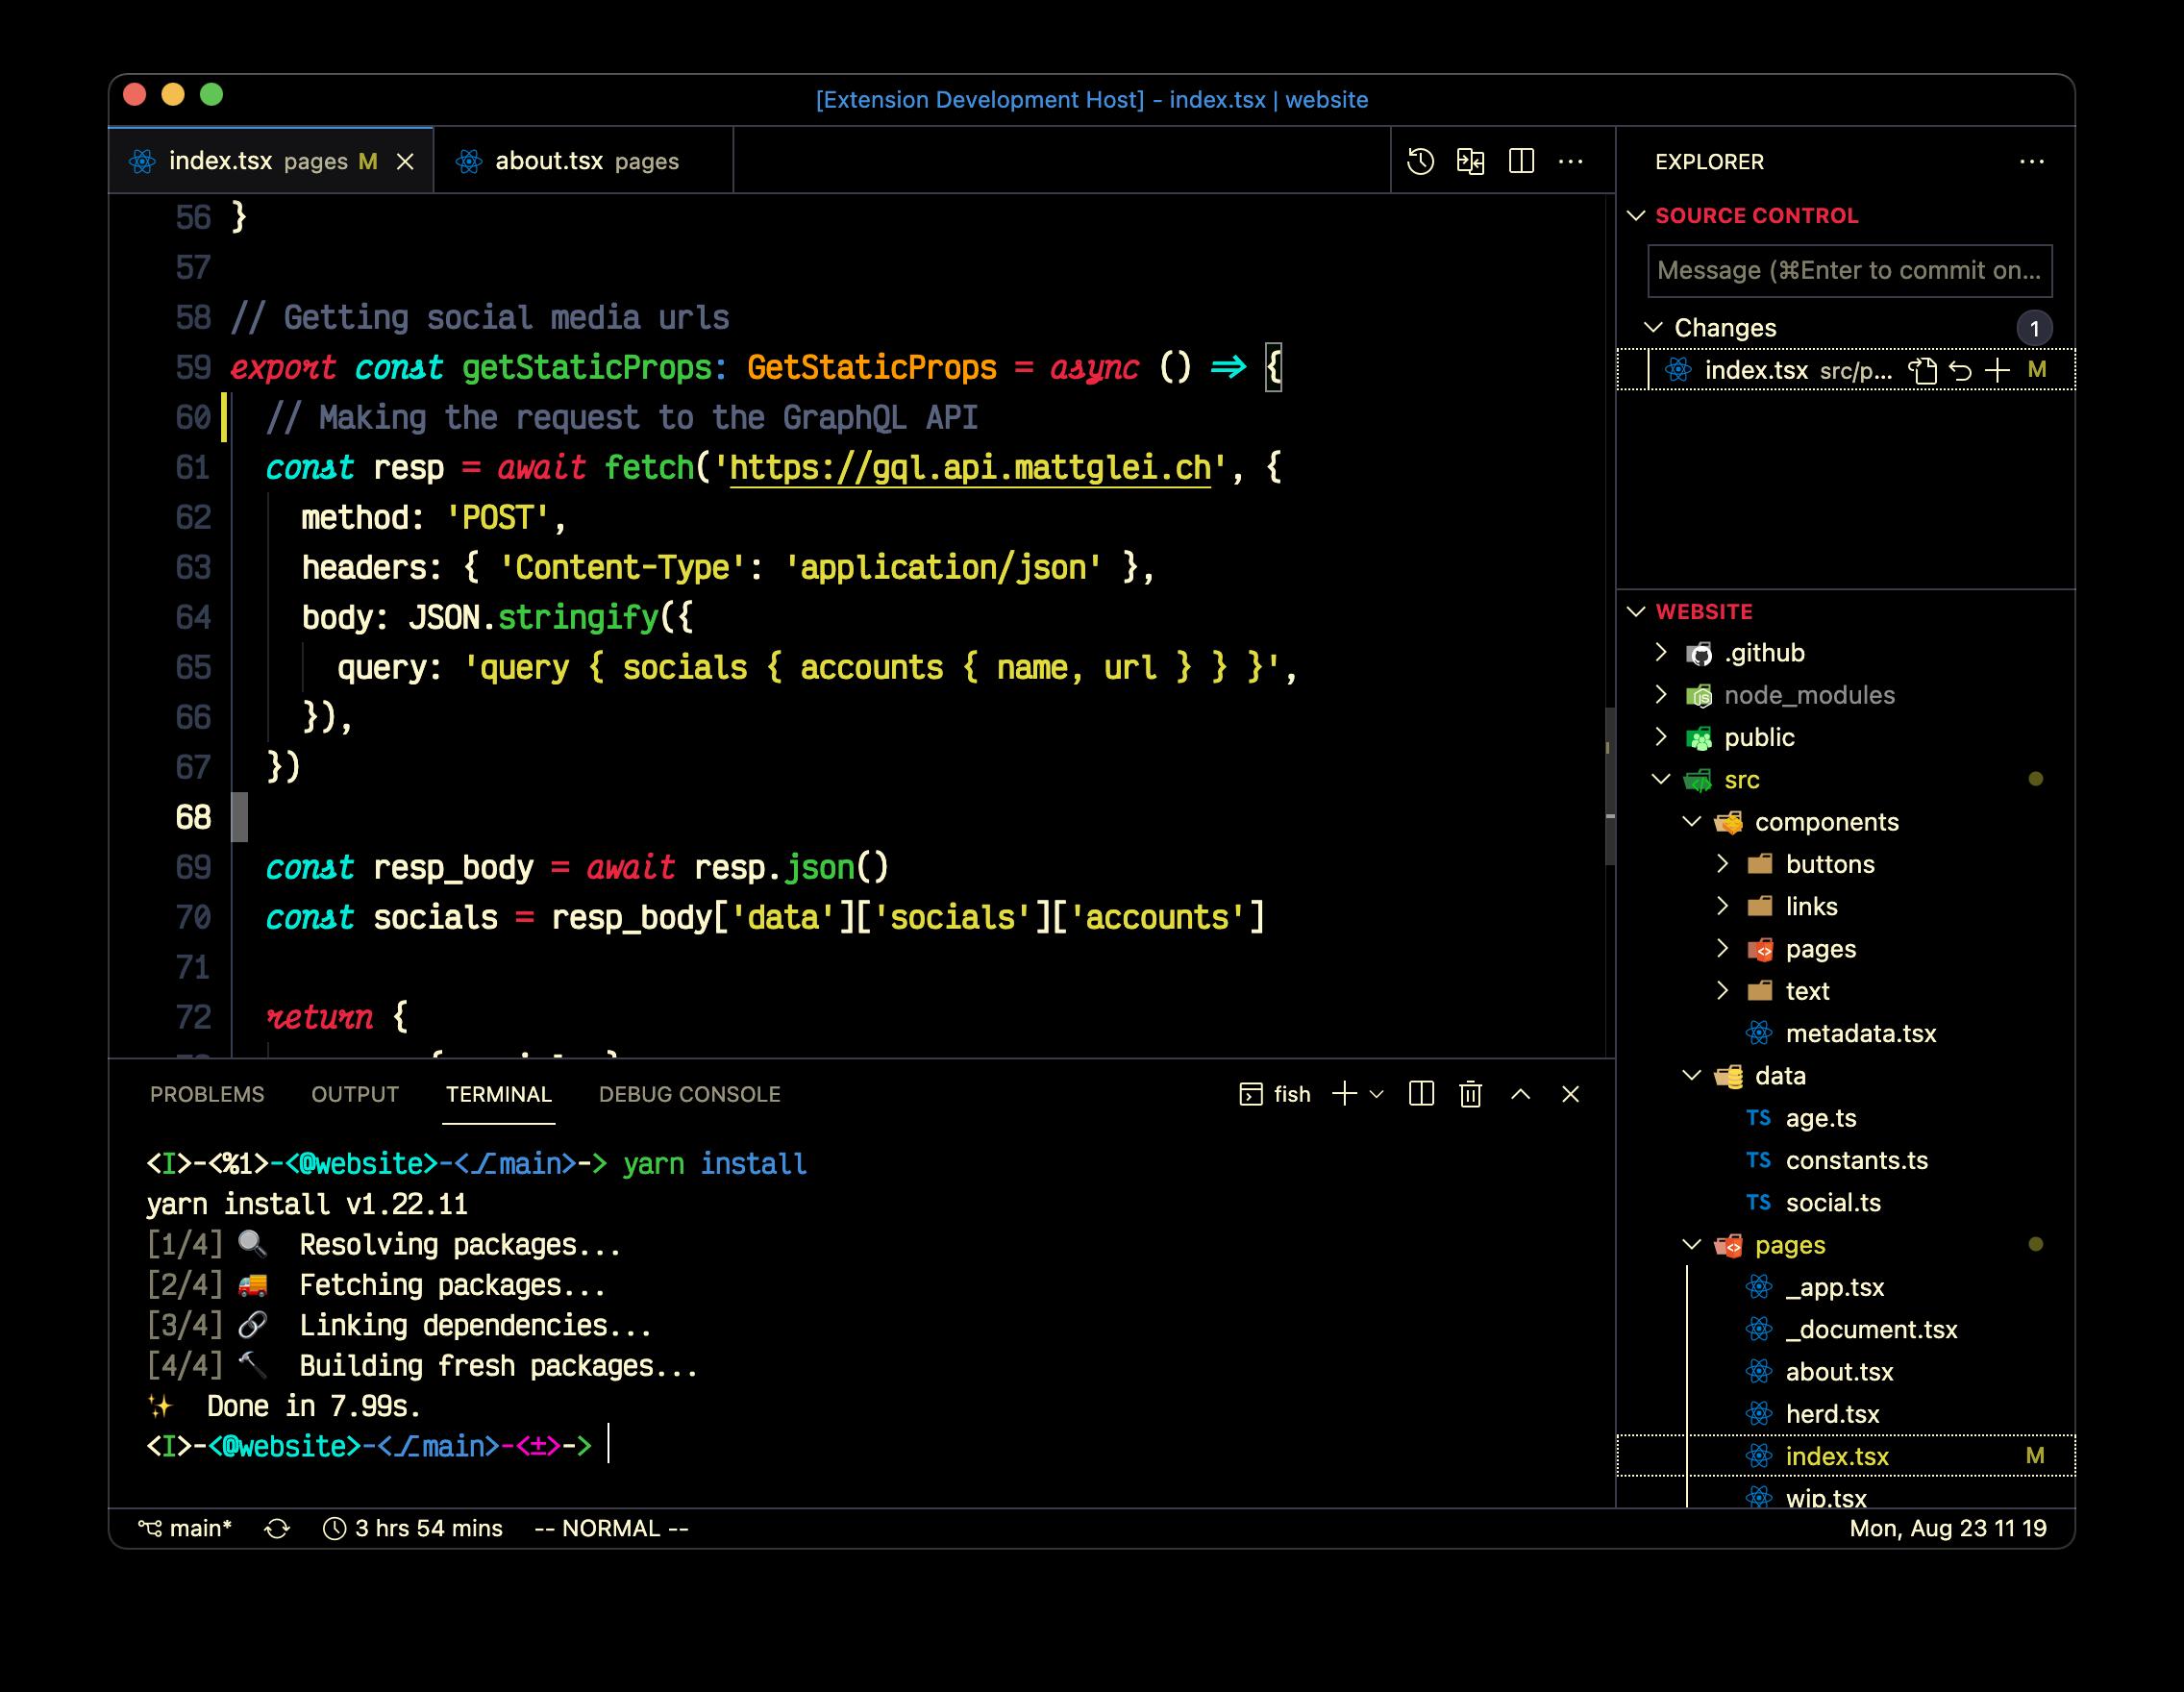 https://cloud-lyebkvdxx-hack-club-bot.vercel.app/0screen_shot_2021-08-23_at_11.19.47_pm.png